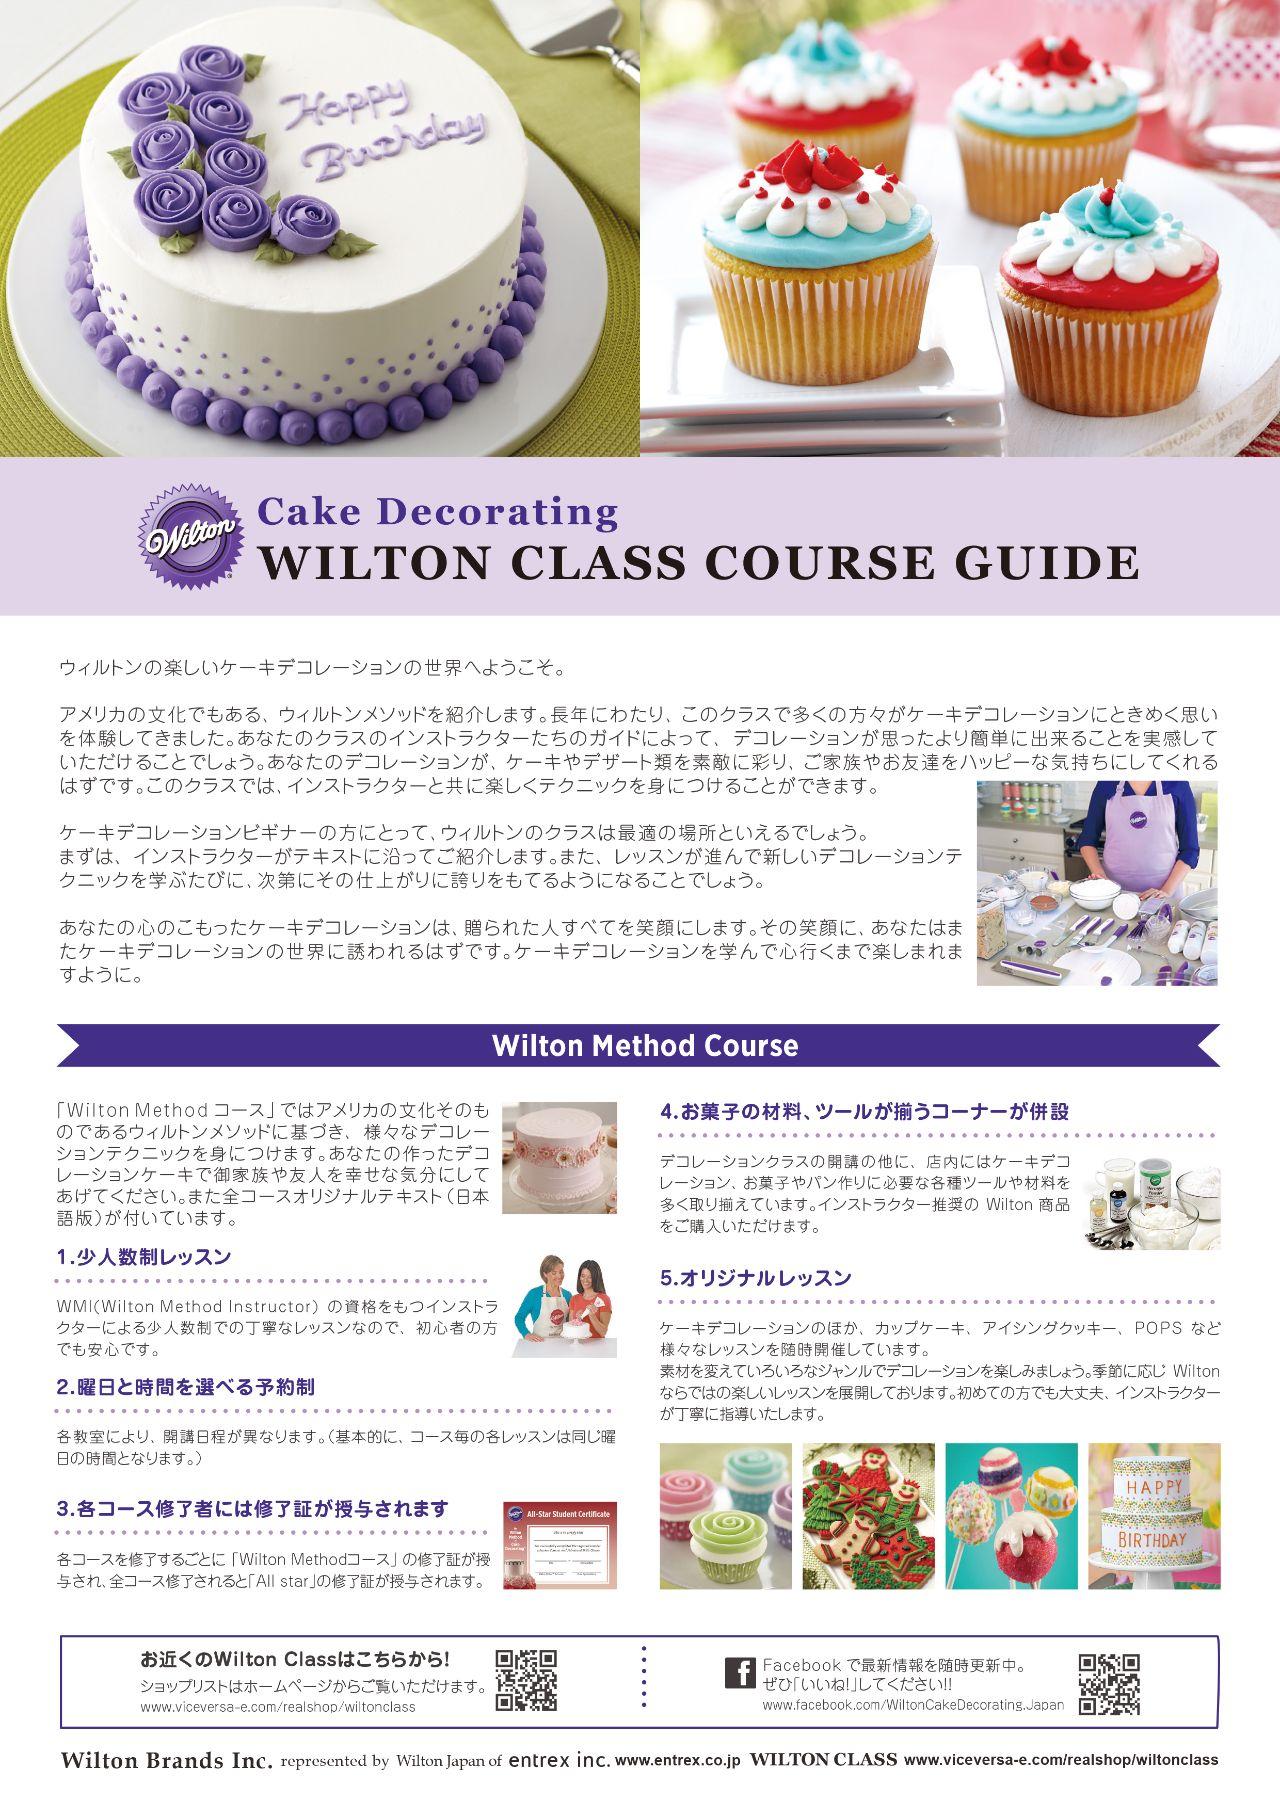 wilton_leaflet01.jpg